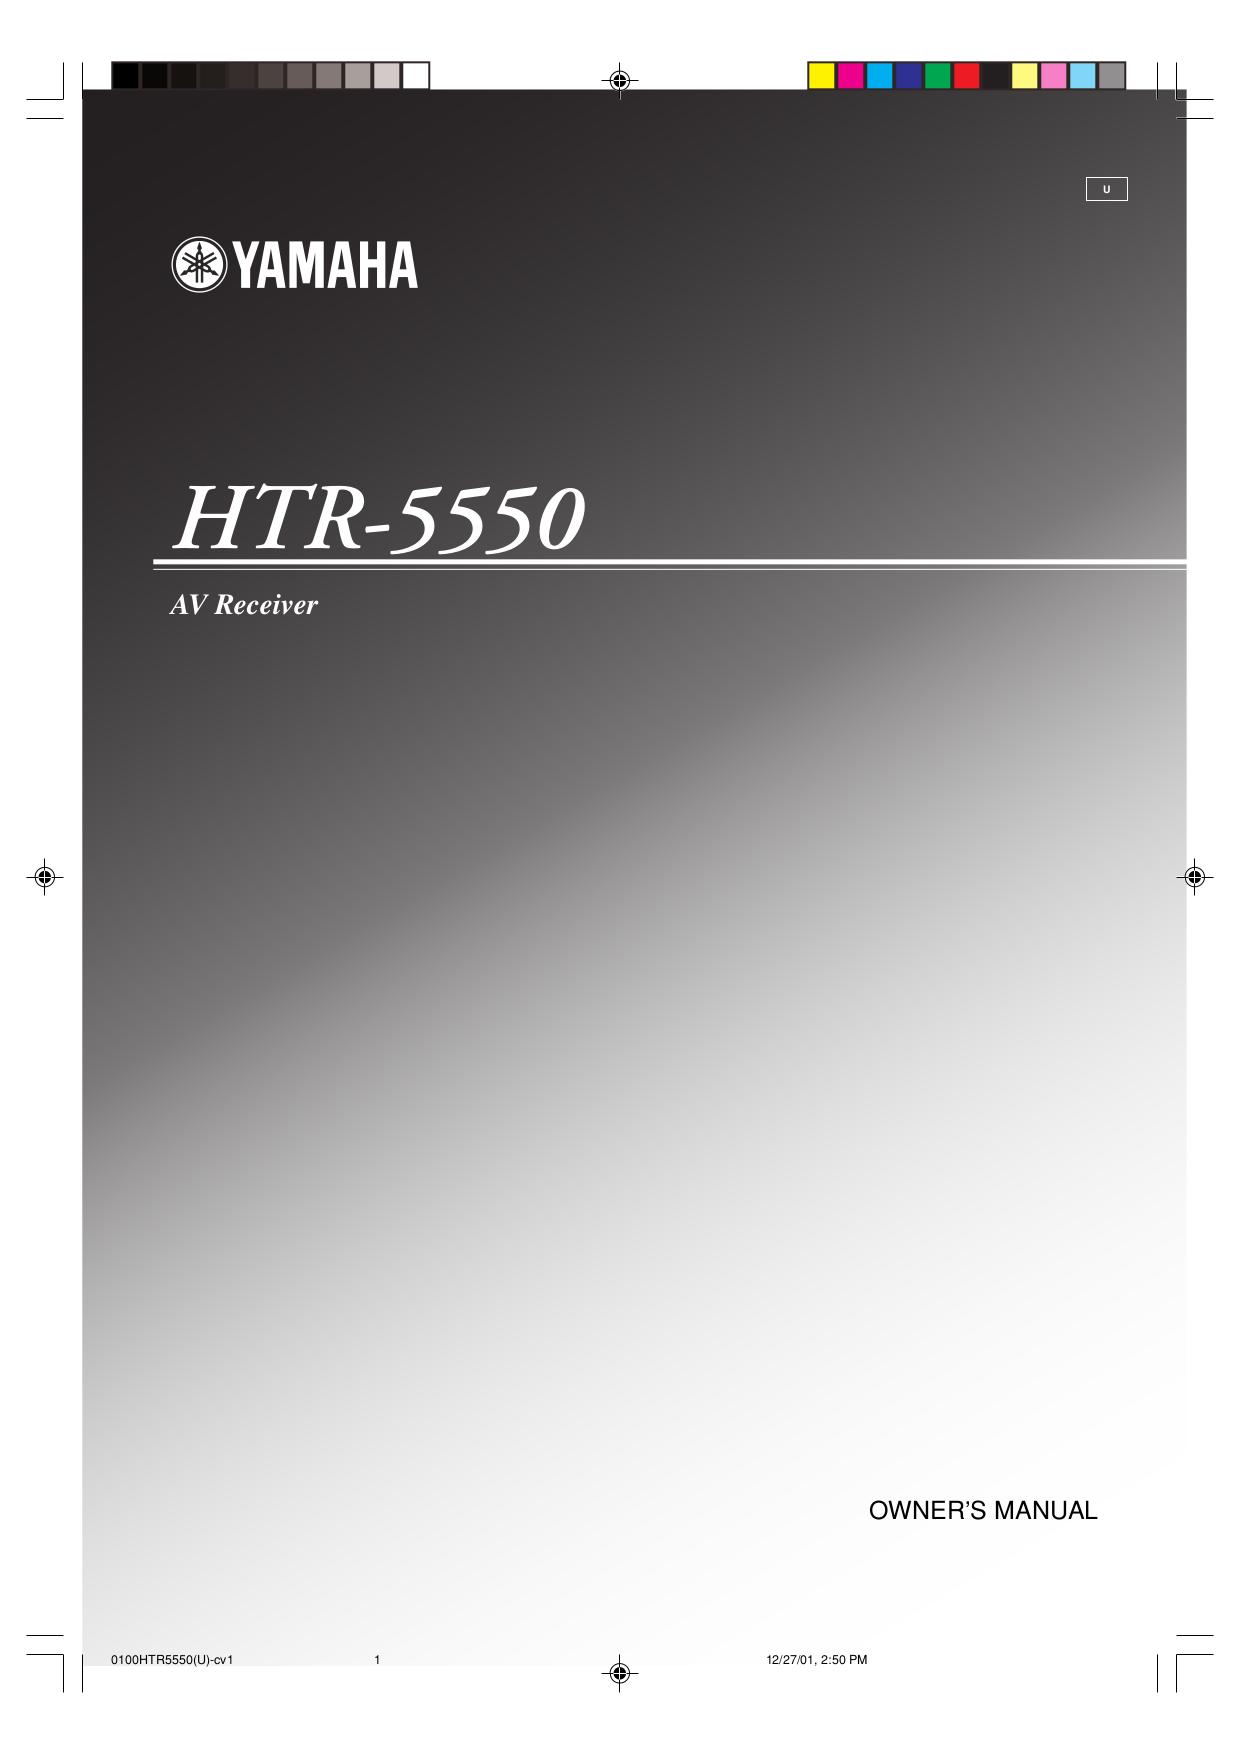 download free pdf for yamaha htr 5550 receiver manual rh umlib com Yamaha HTR 5550 Manual PDF Yamaha HTR 5550 Manual PDF